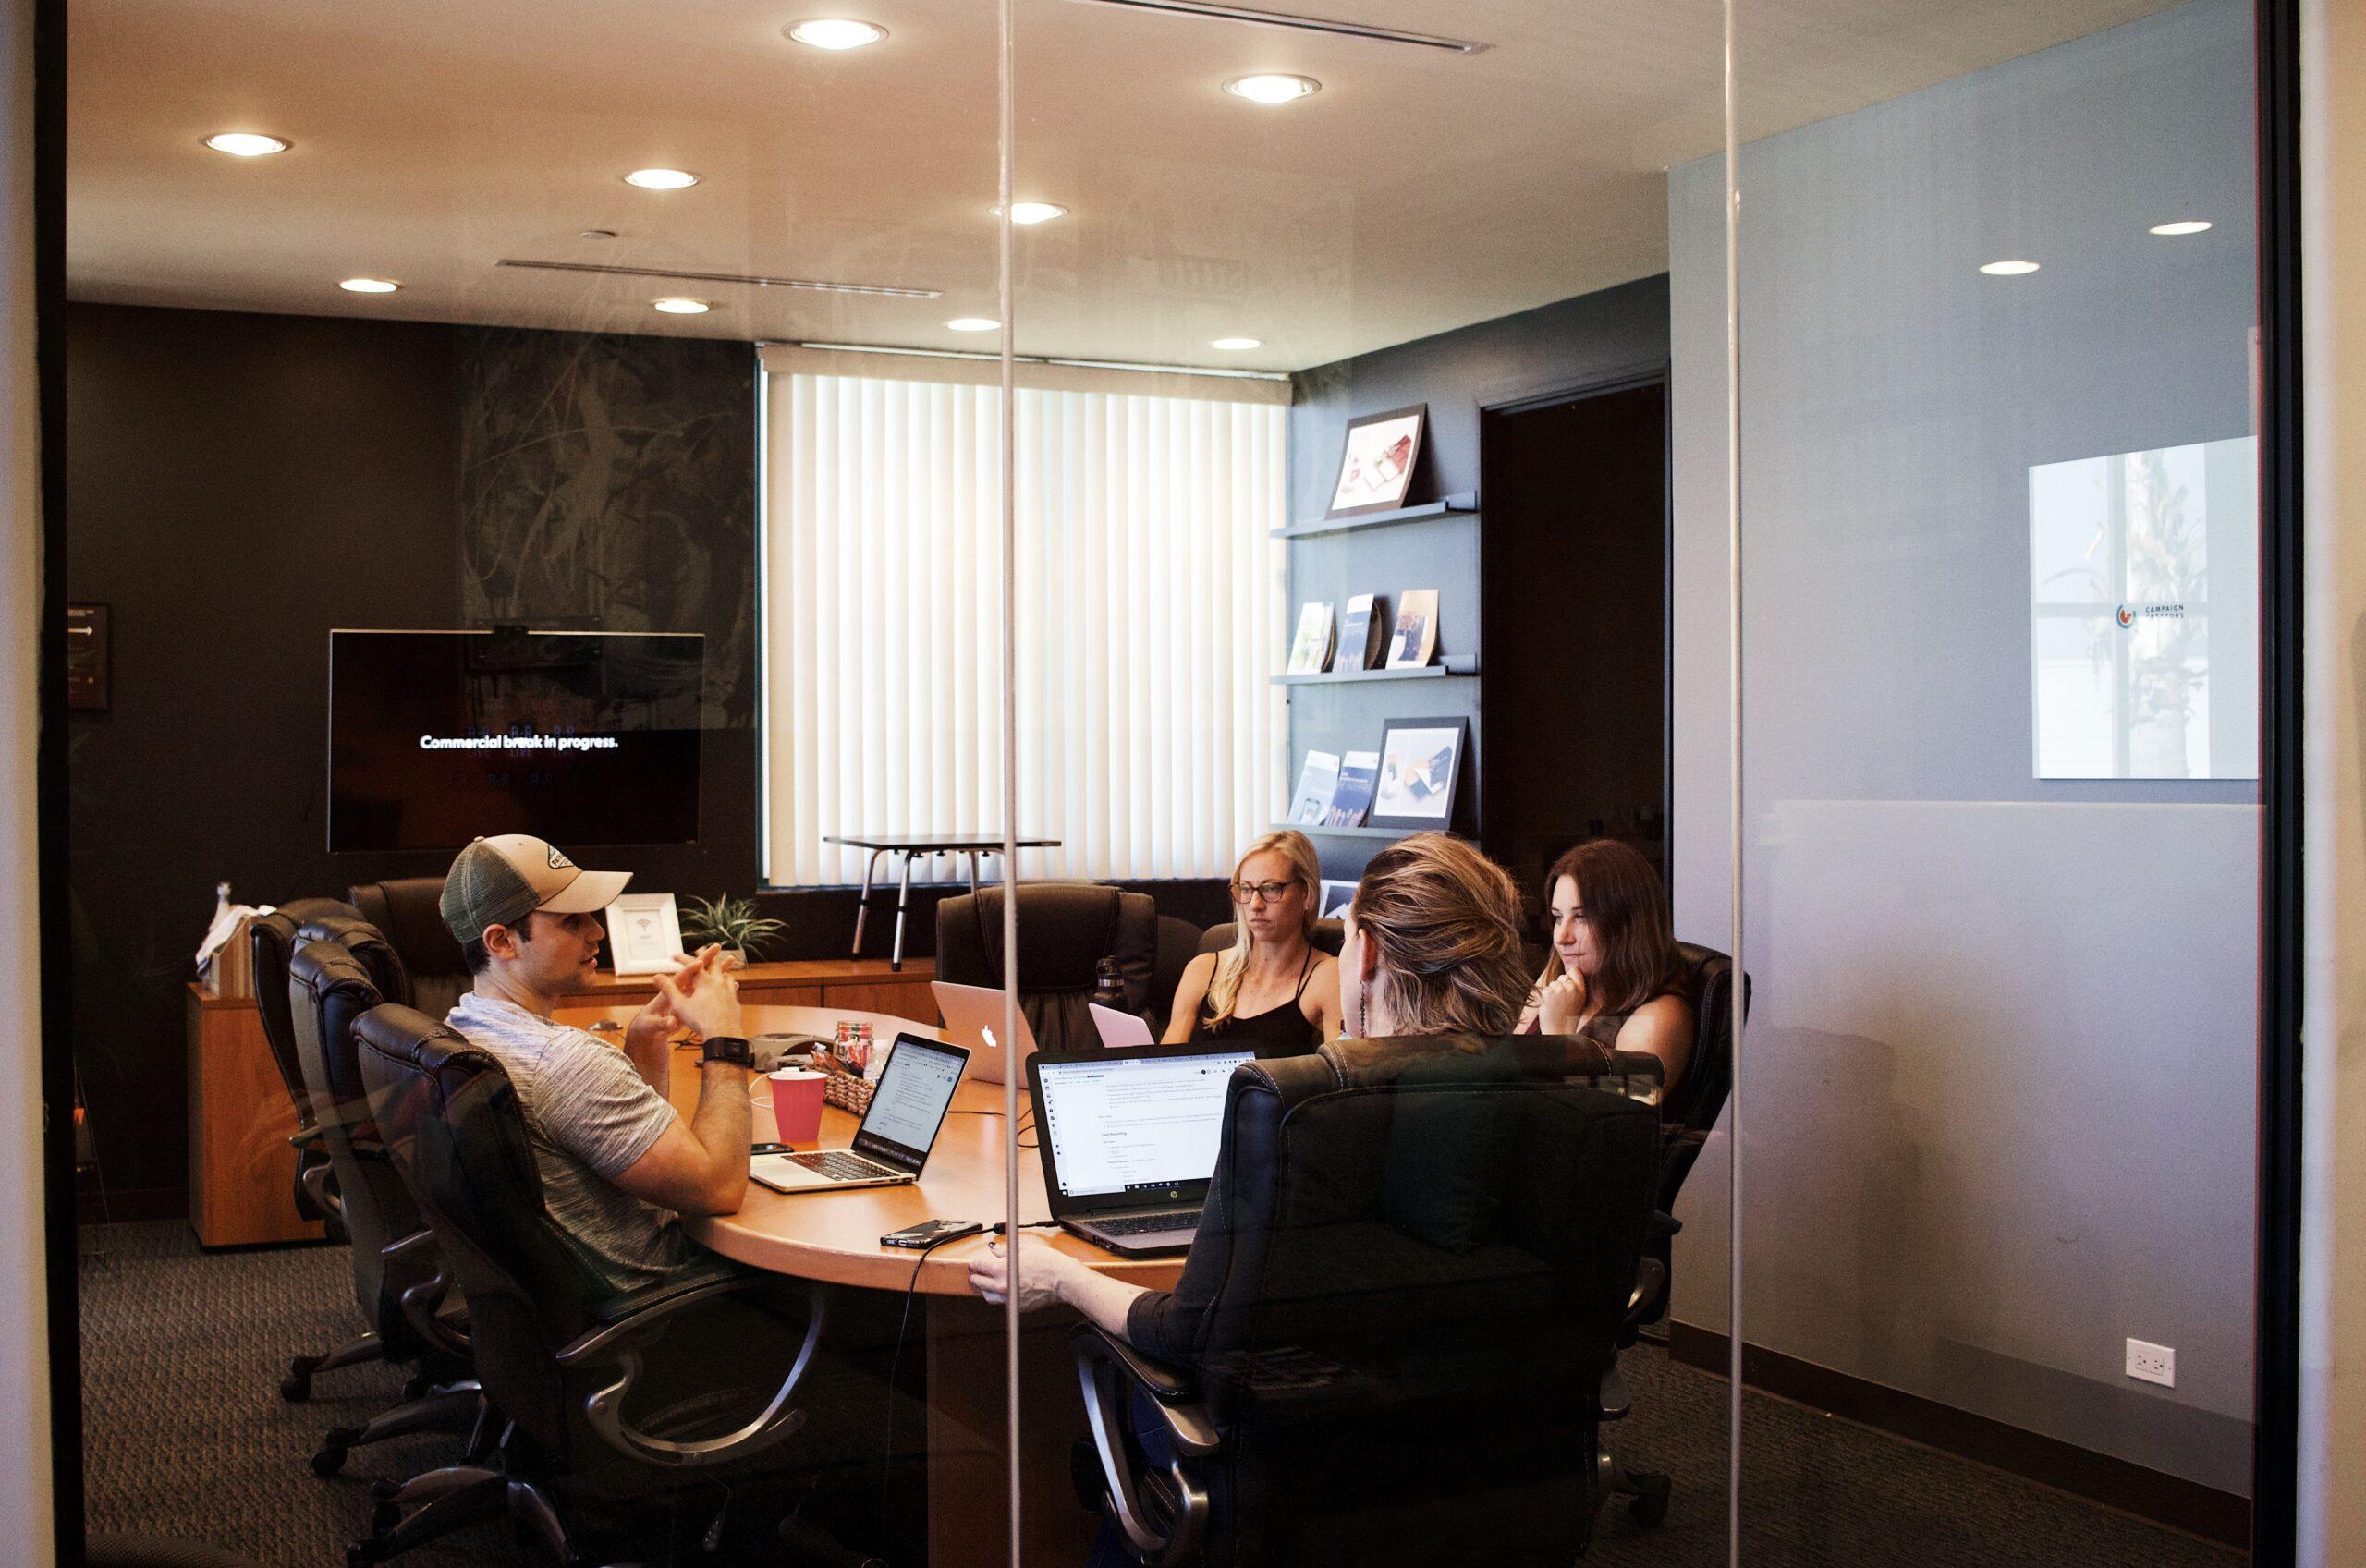 campaign-creators-Students around Board room table -Unsplash